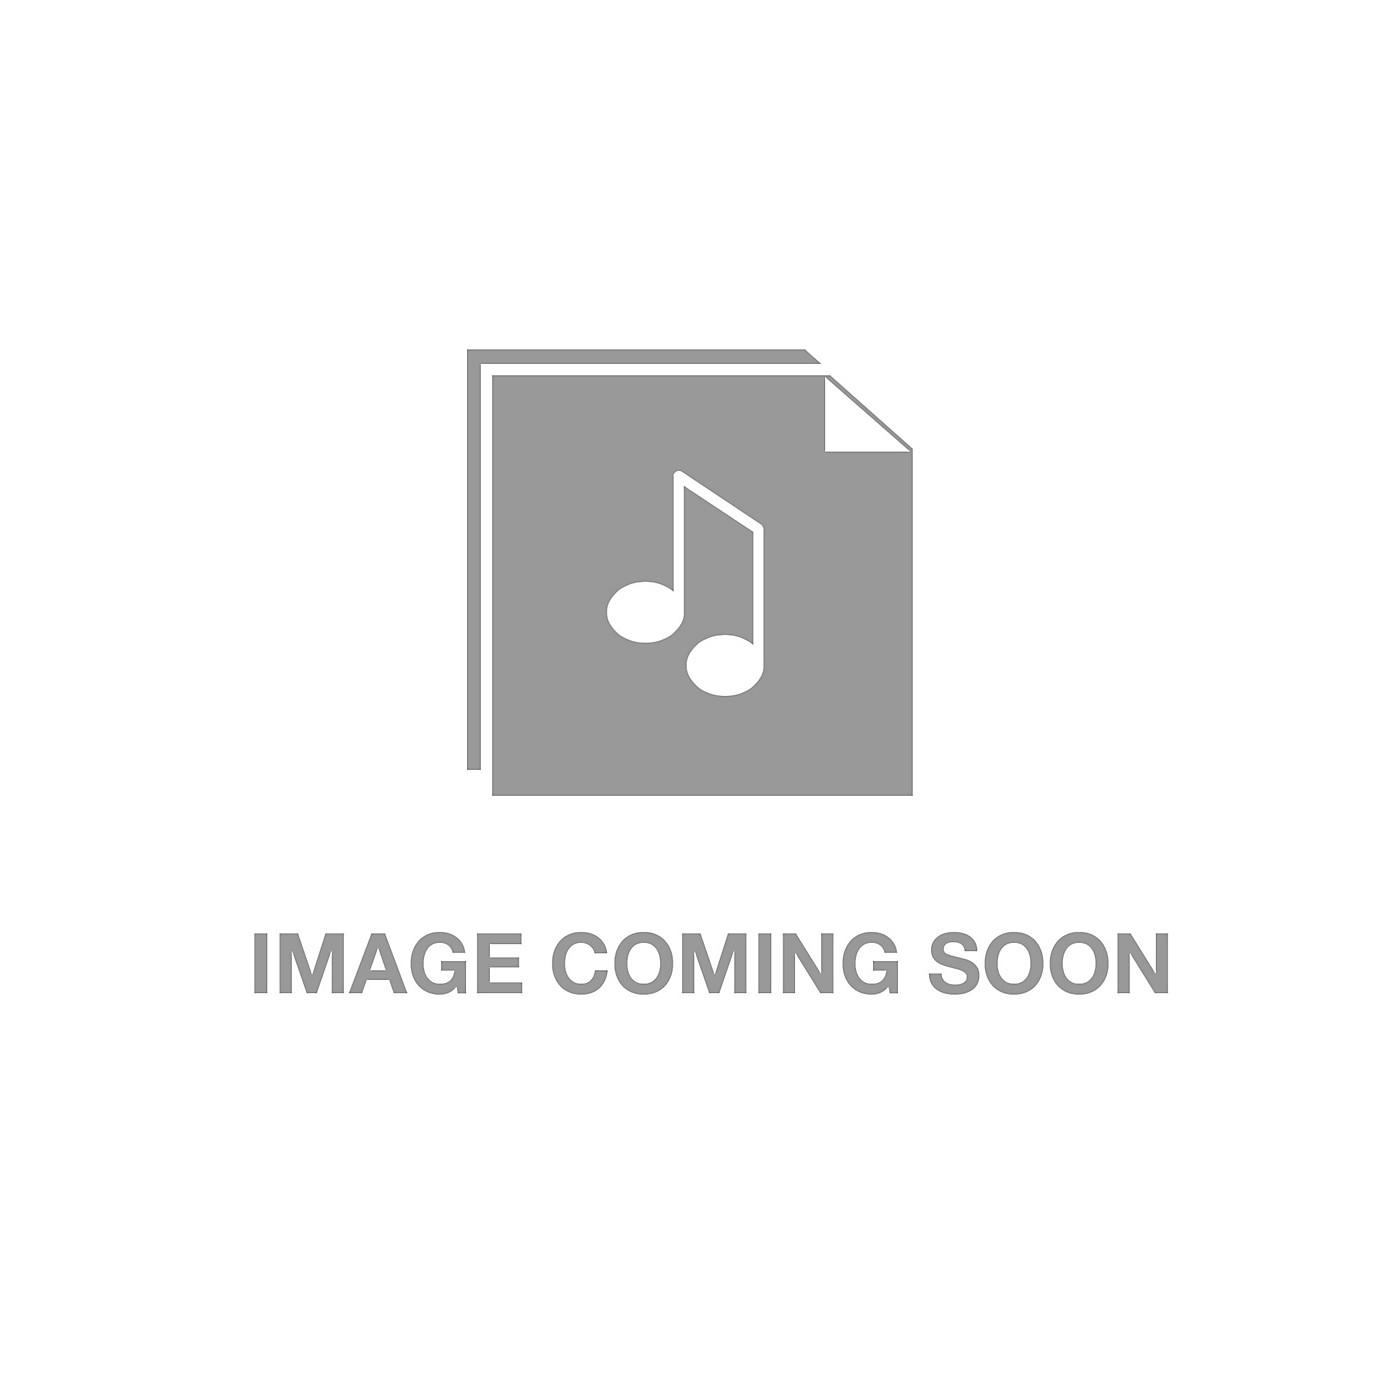 Hal Leonard The Beatles: Revolver Choral Suite For Satb Choir thumbnail